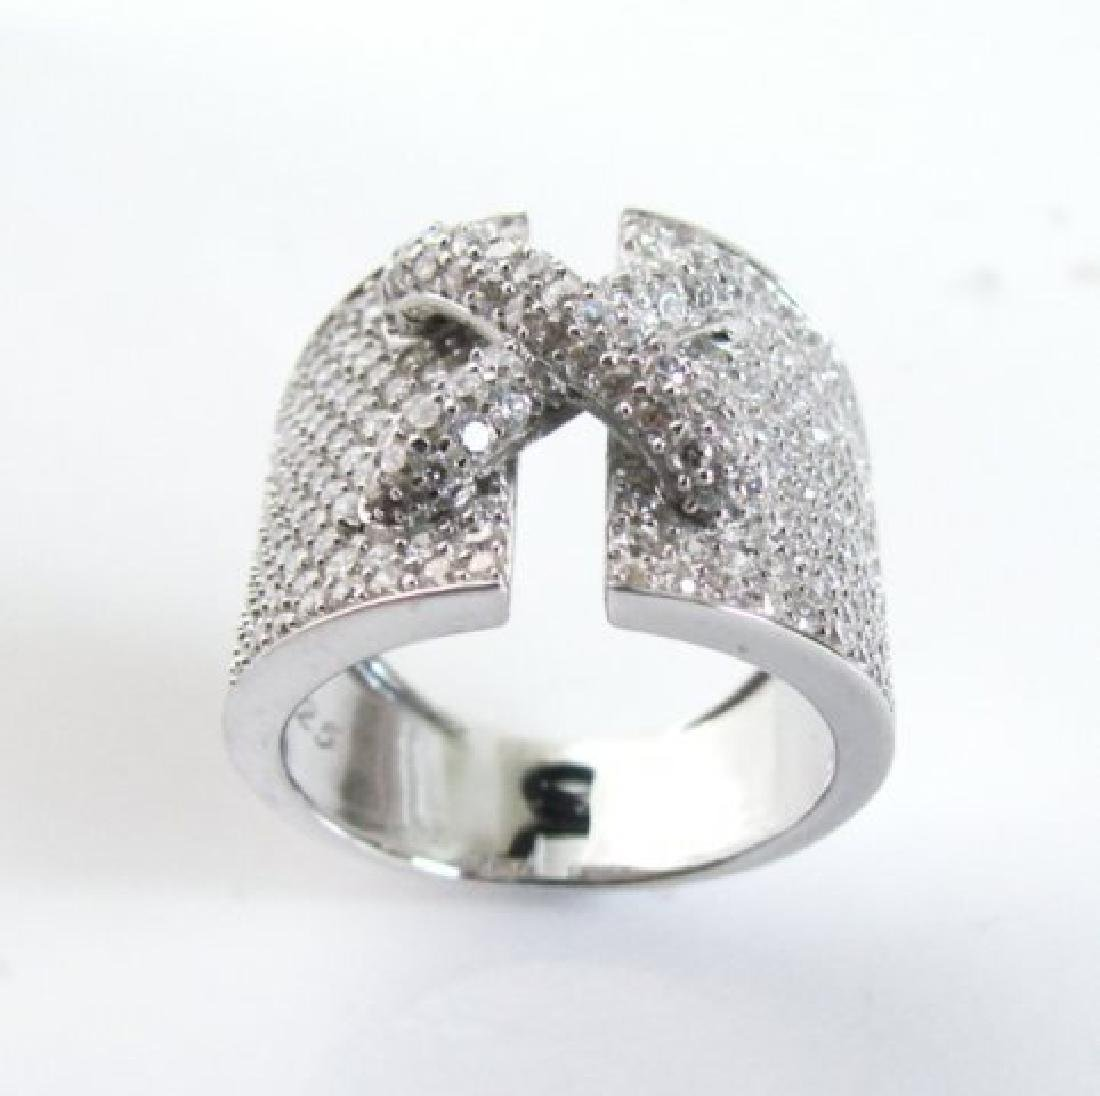 Creation Diamond  Ring 3.20Ct 18k W /g Overlay - 2